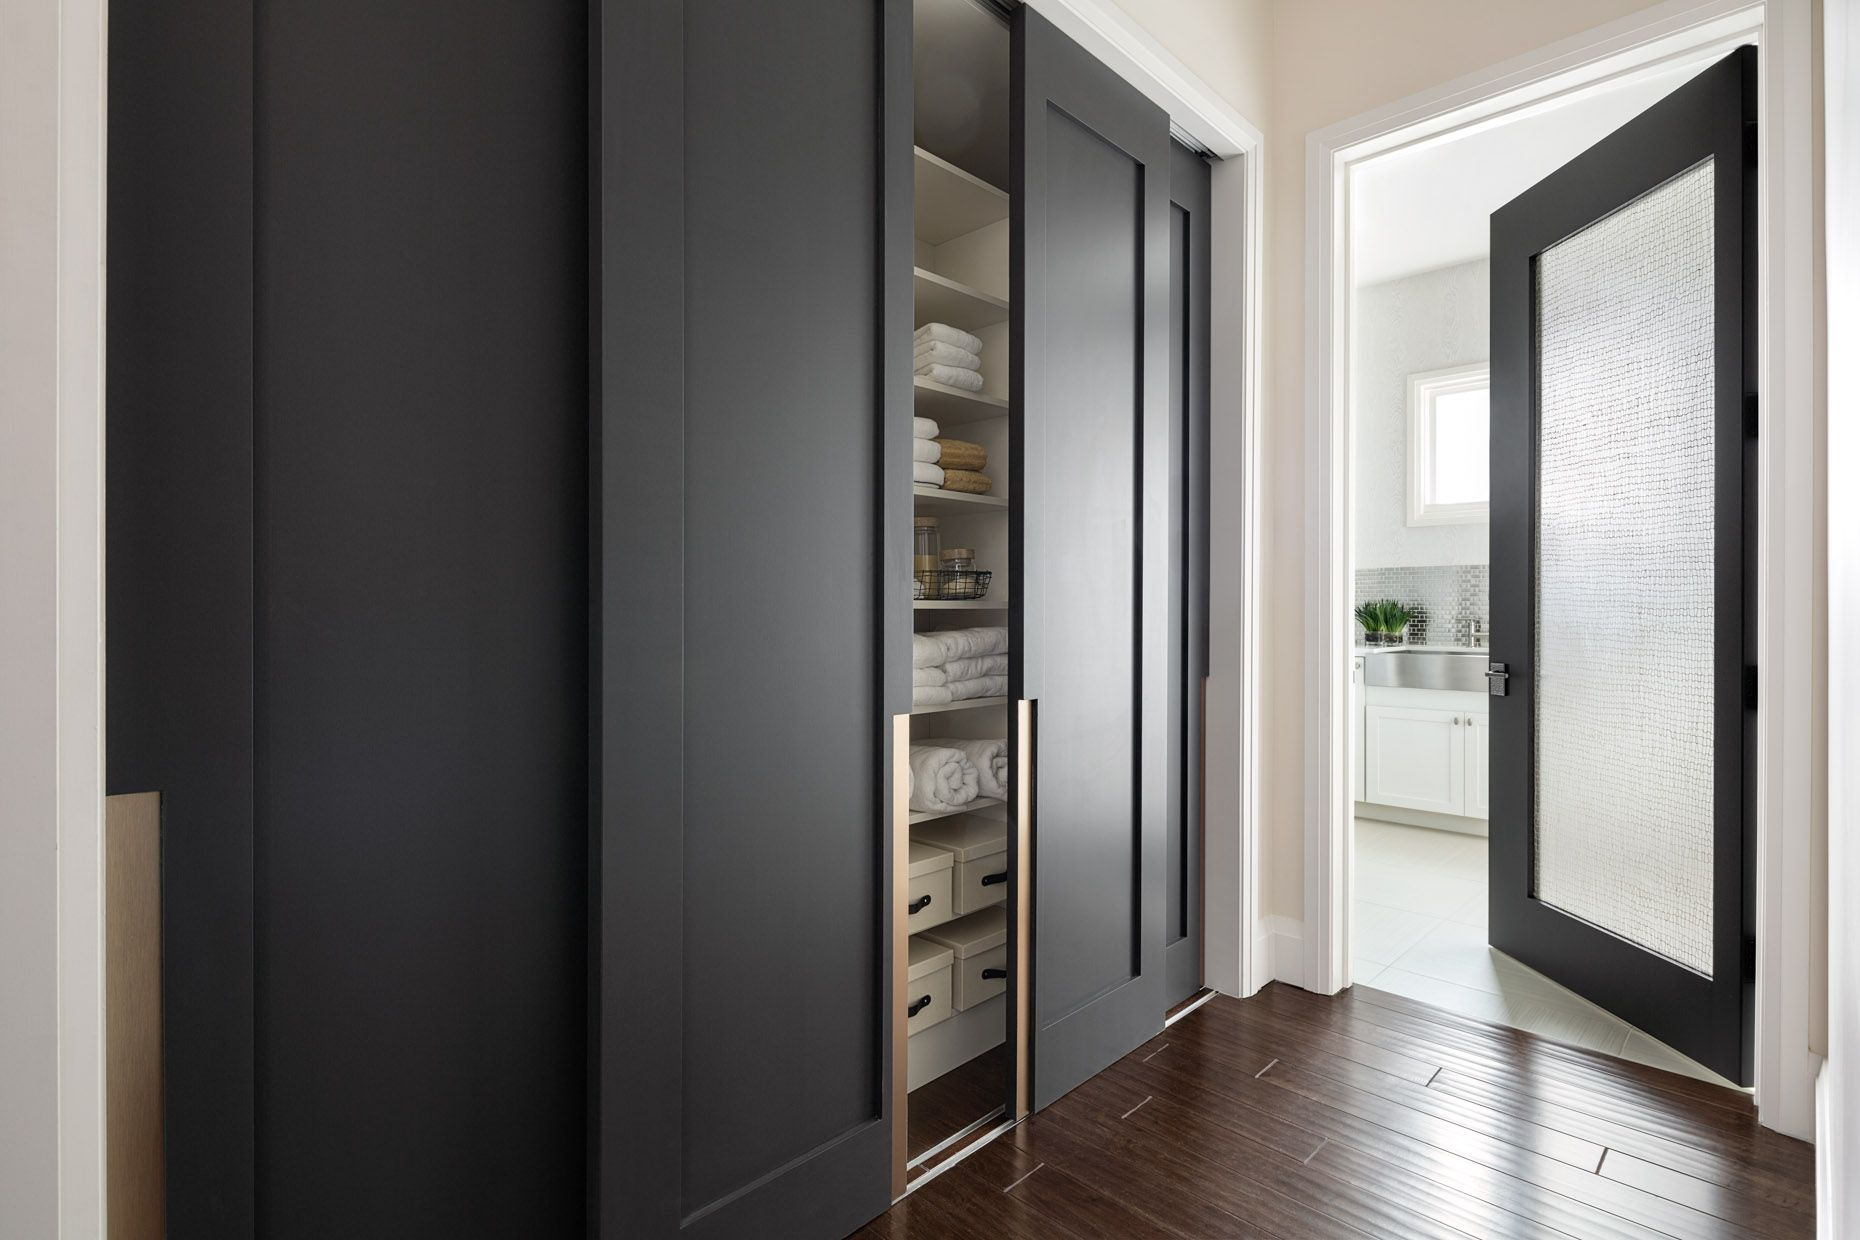 Trustile Modern Door Collection Tm1000 In Mdf With